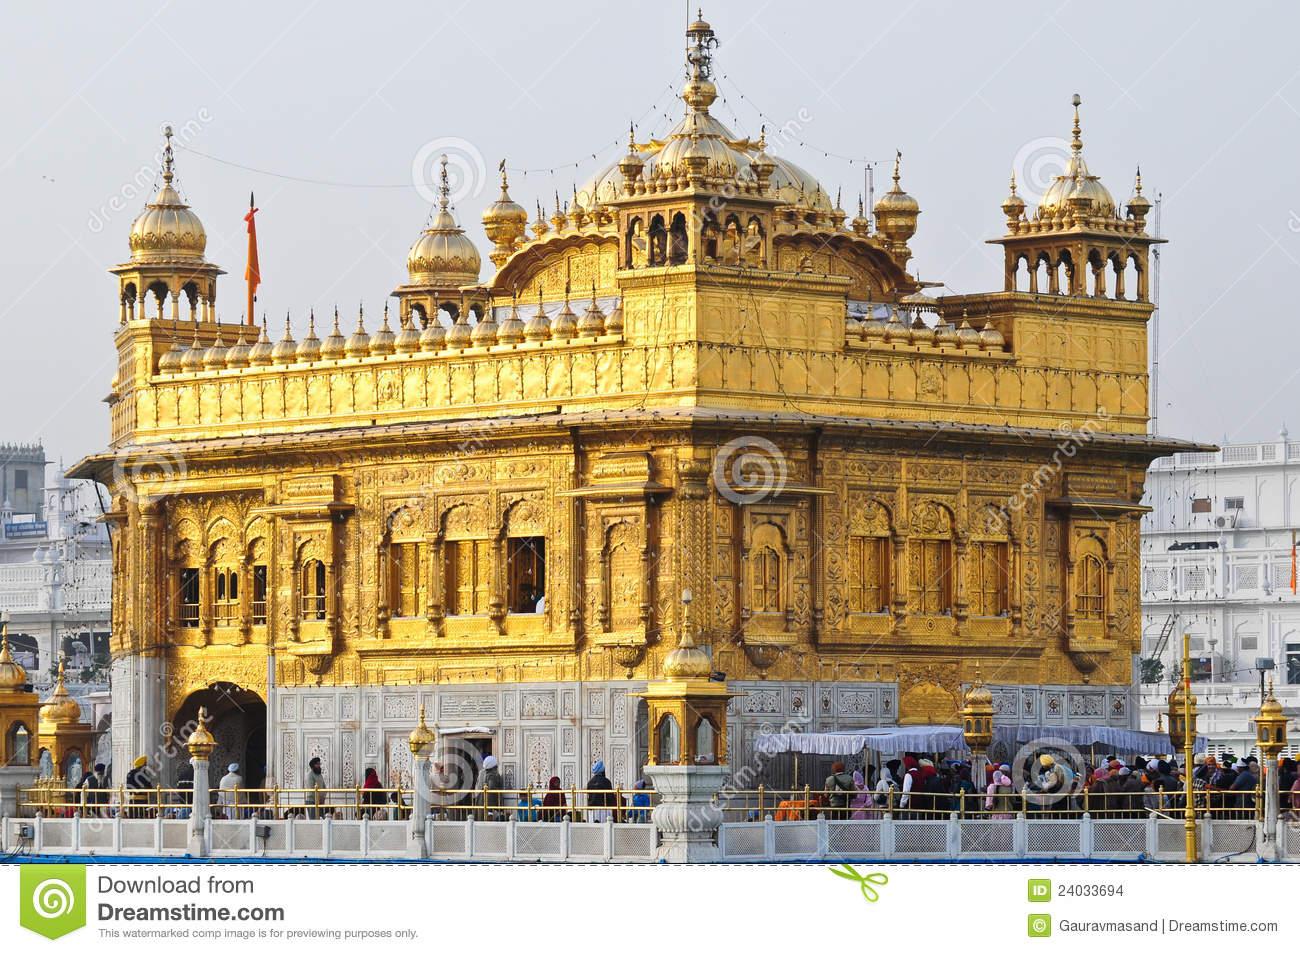 Golden temple clipart download.